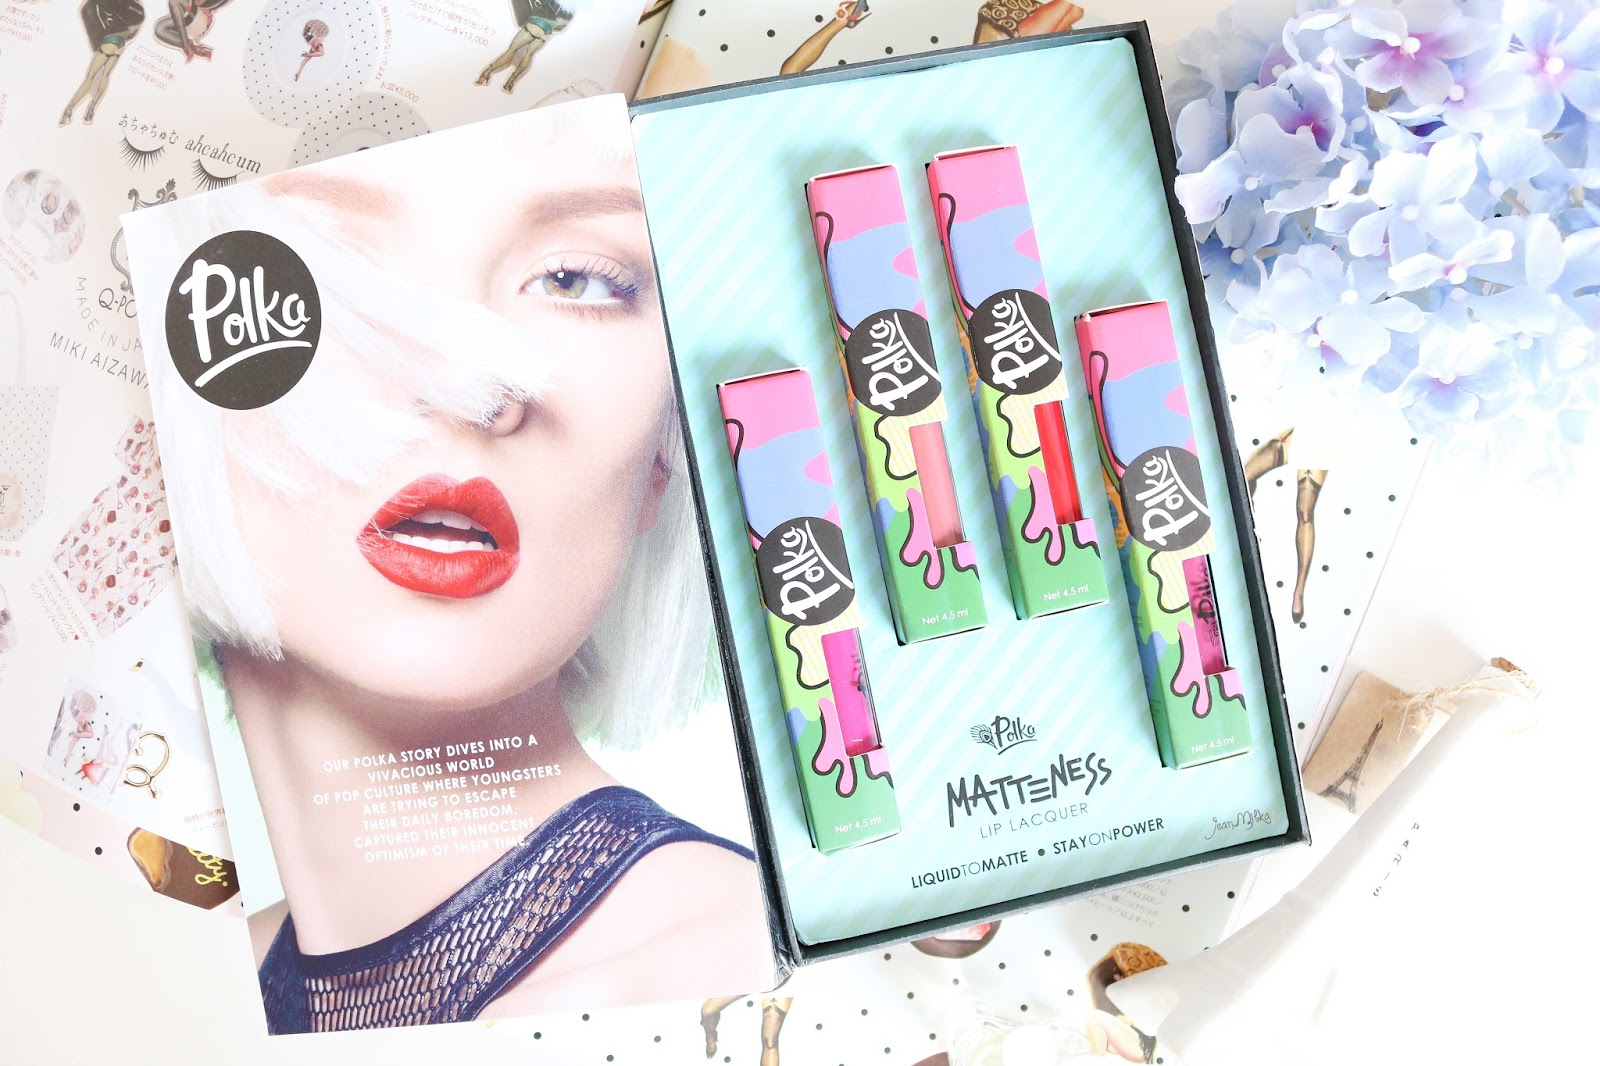 polka, polka beauty, lip lacquer, polka cosmetics, polka matteness, polka lip lacquer, matte lipstick, matte, lip, review, swatch, drugstore, produk indonesia